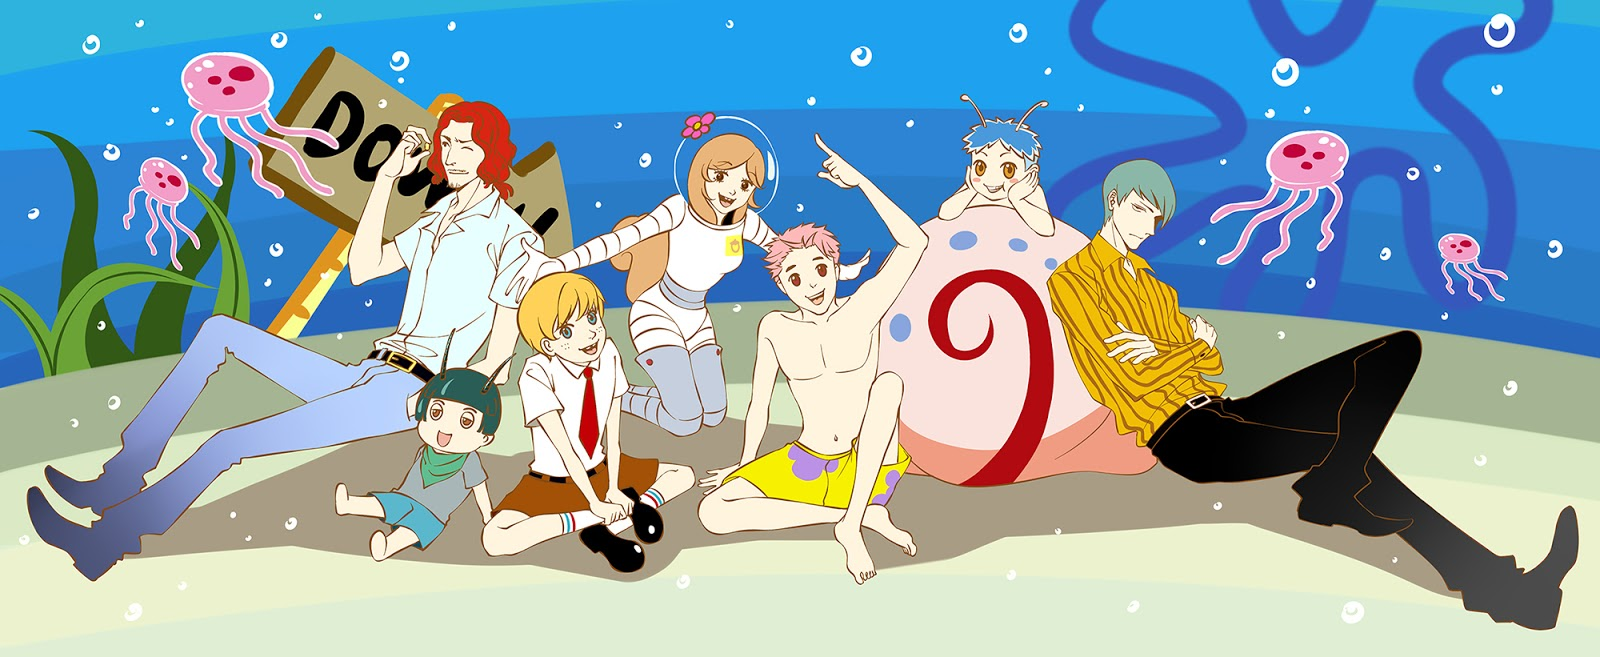 Squarepants characters spongebob squarepants characters spongebob